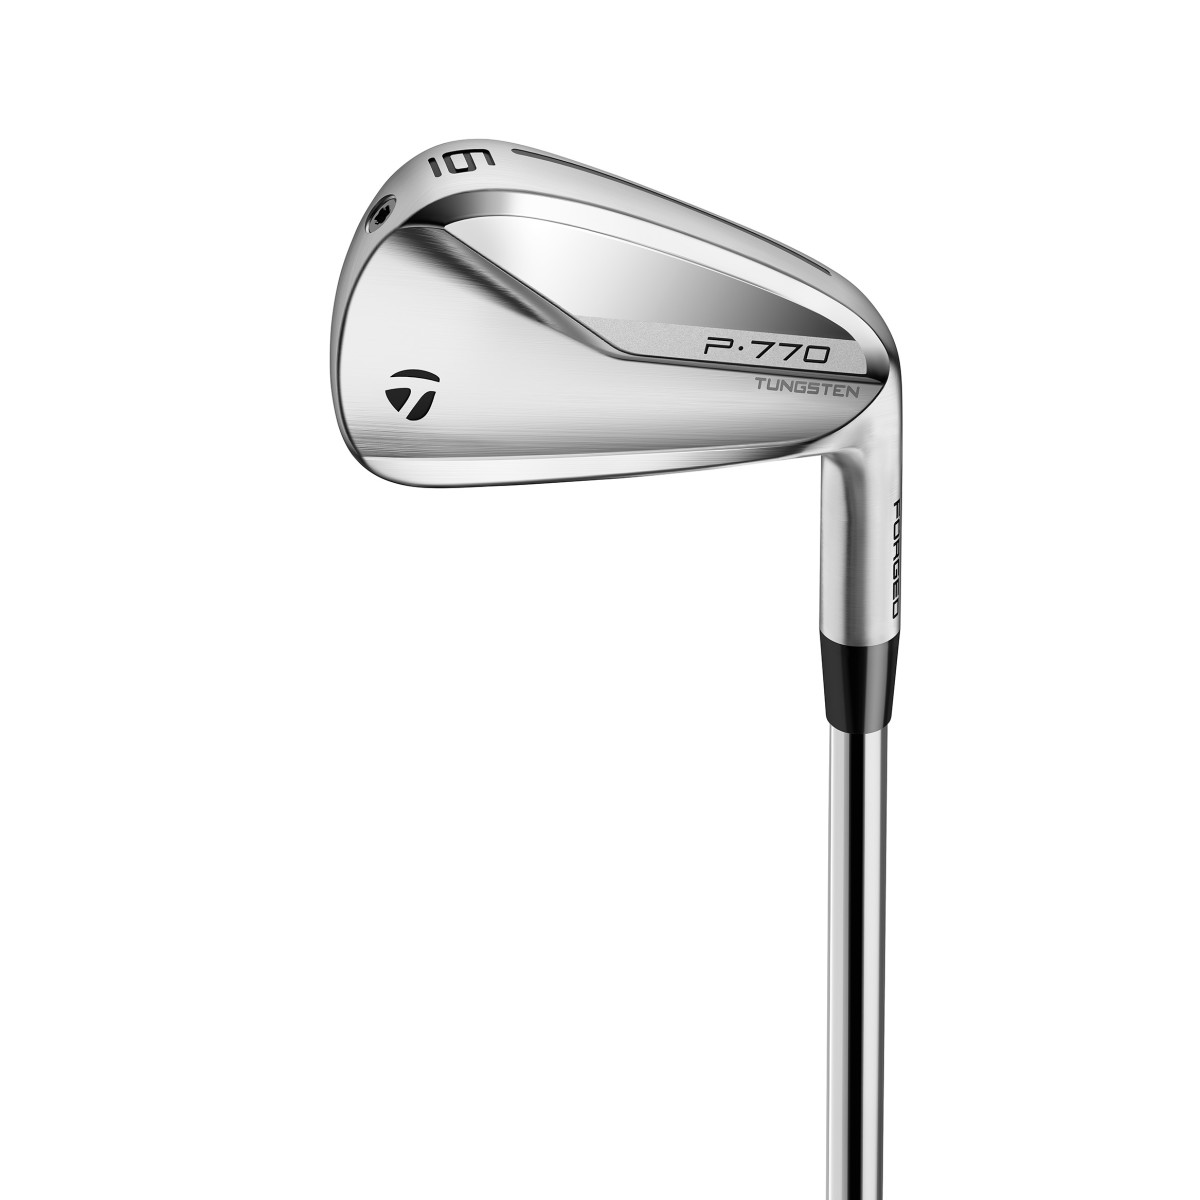 TaylorMade P770 iron